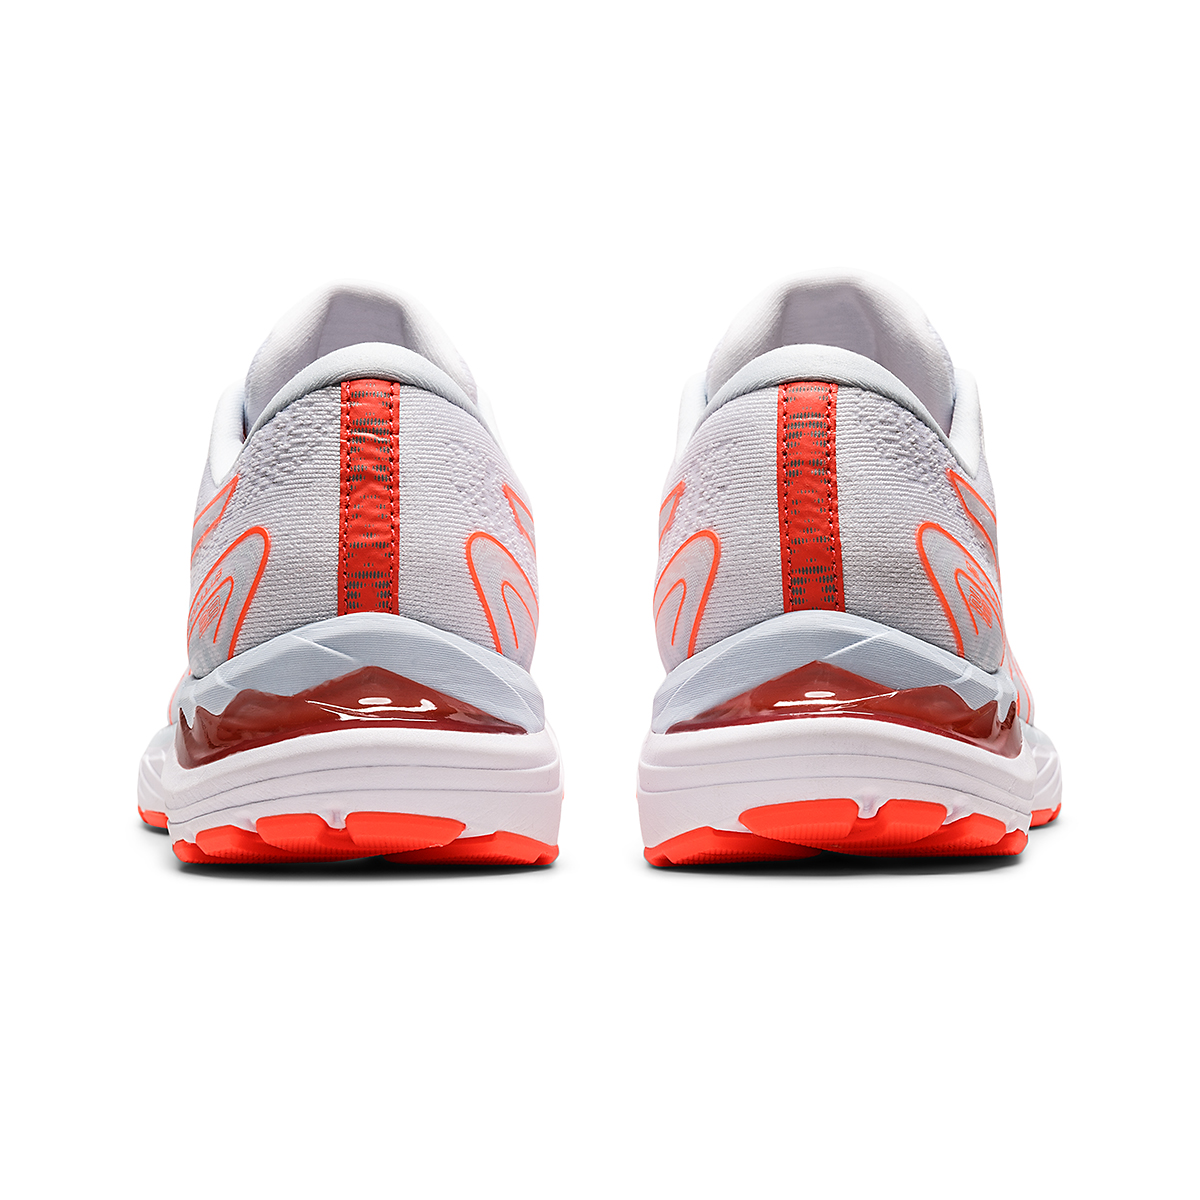 Women's Asics Gel-Cumulus 23 Running Shoe - Color: White/Sky - JackRabbit Exclusive - Size: 5 - Width: Regular, White/Sky - JackRabbit Exclusive, large, image 5